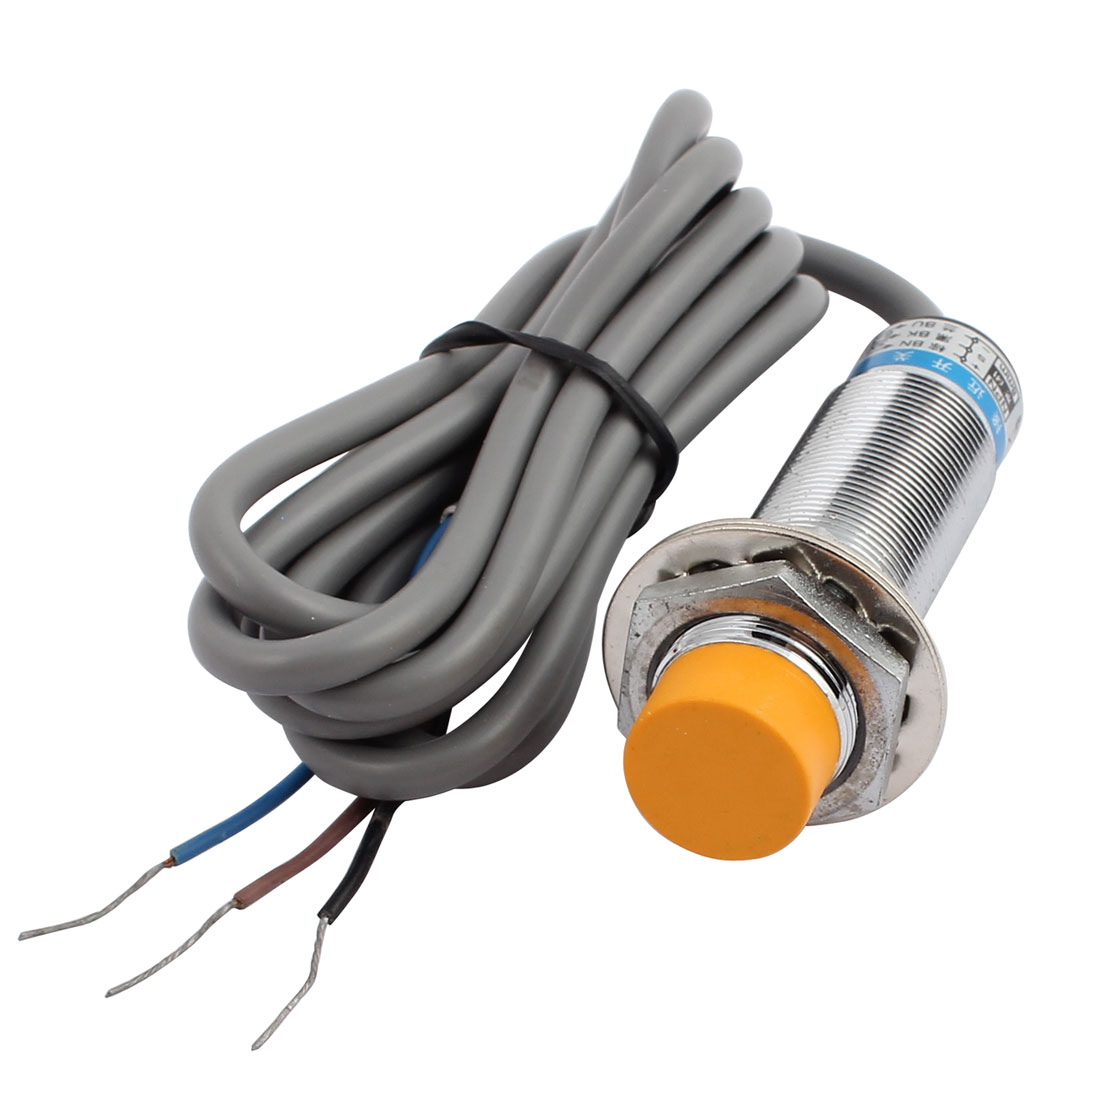 LJ18A3-8-Z/AX DC 6-36V 300mA NPN NC 8mm Inductive Proximity Sensor Switch 3-wire